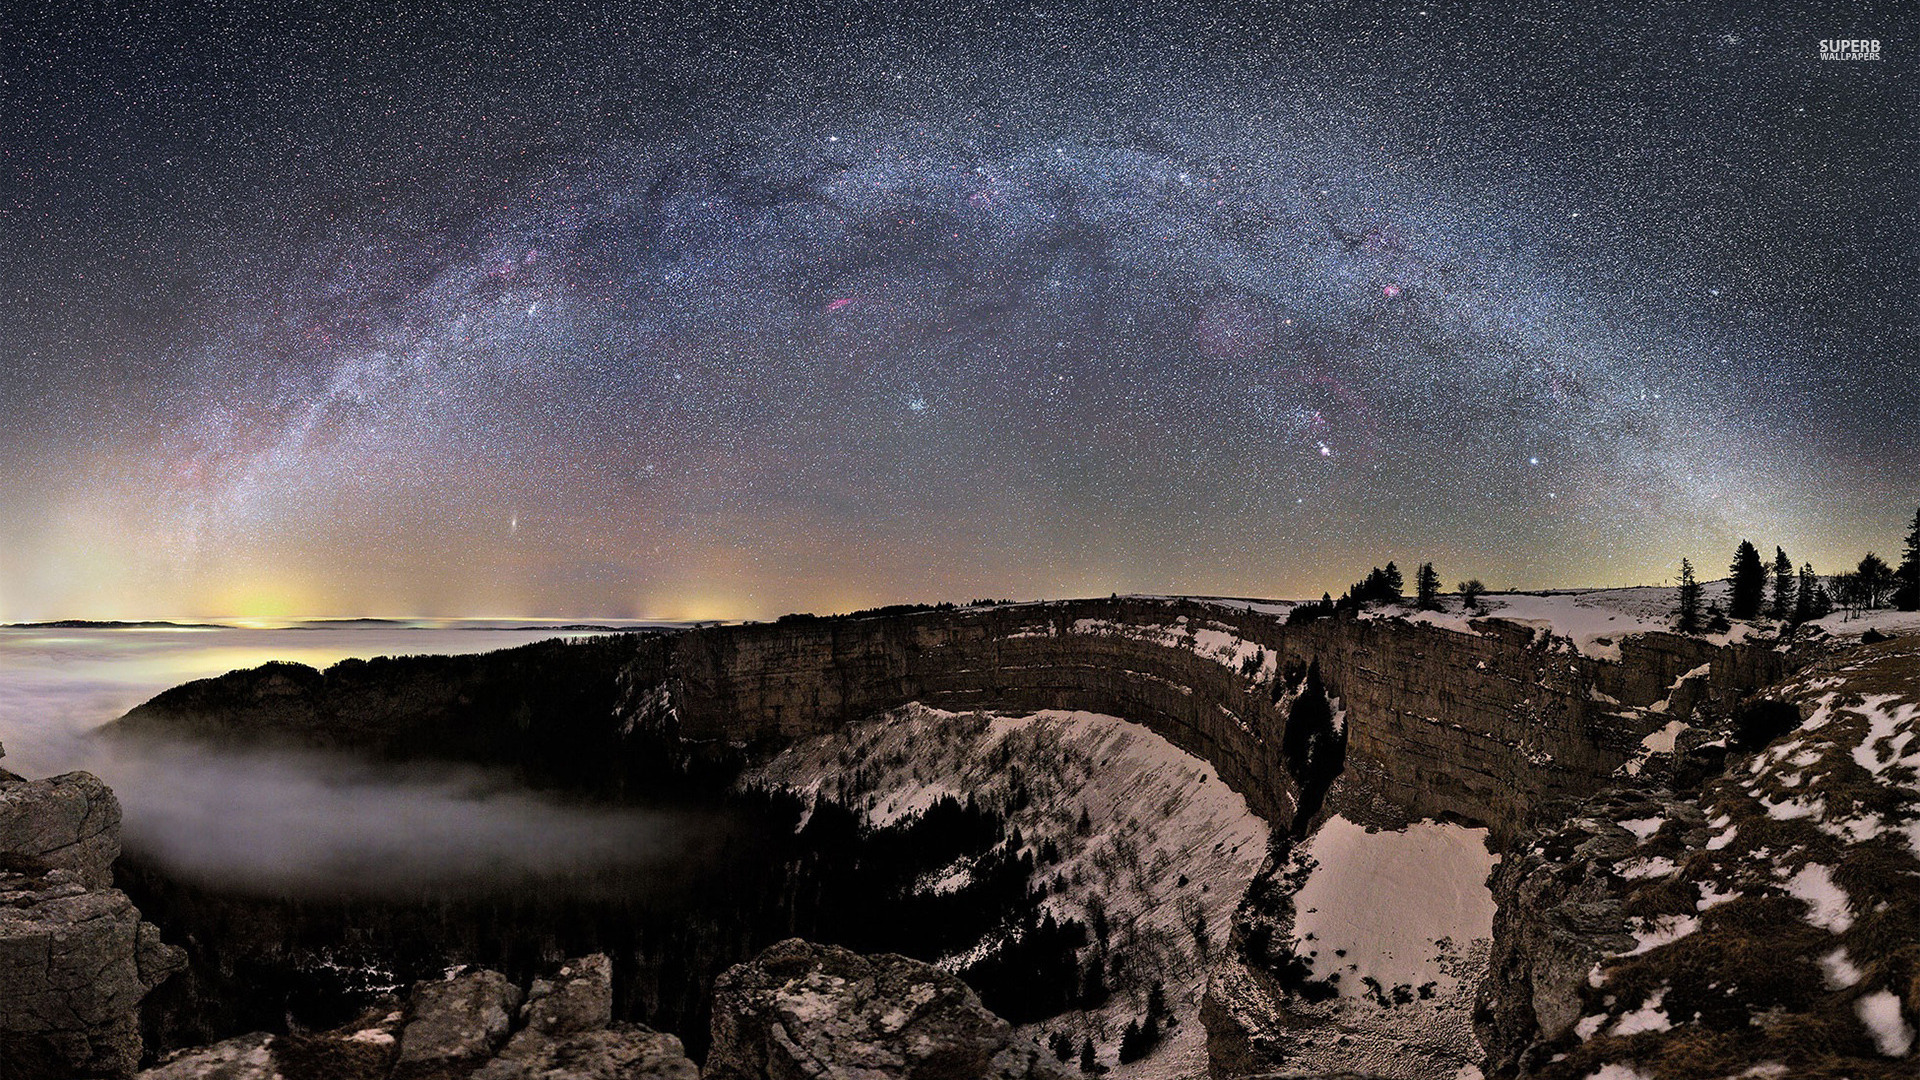 milky way galaxy live wallpaper - photo #43